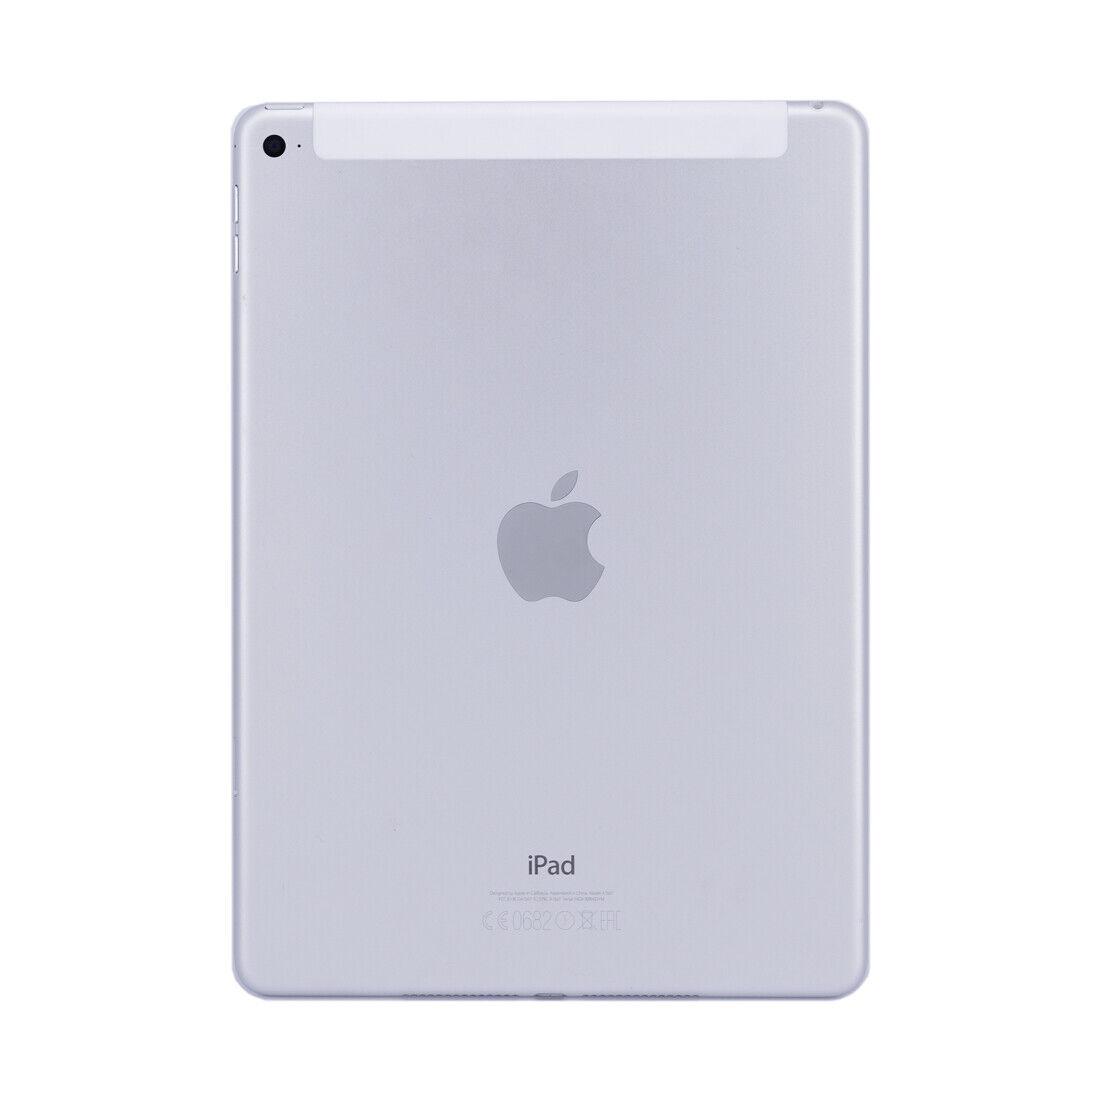 iPad: iPad Air 2 WiFi + cell 64GB Silver – Grade A/B – No scatola